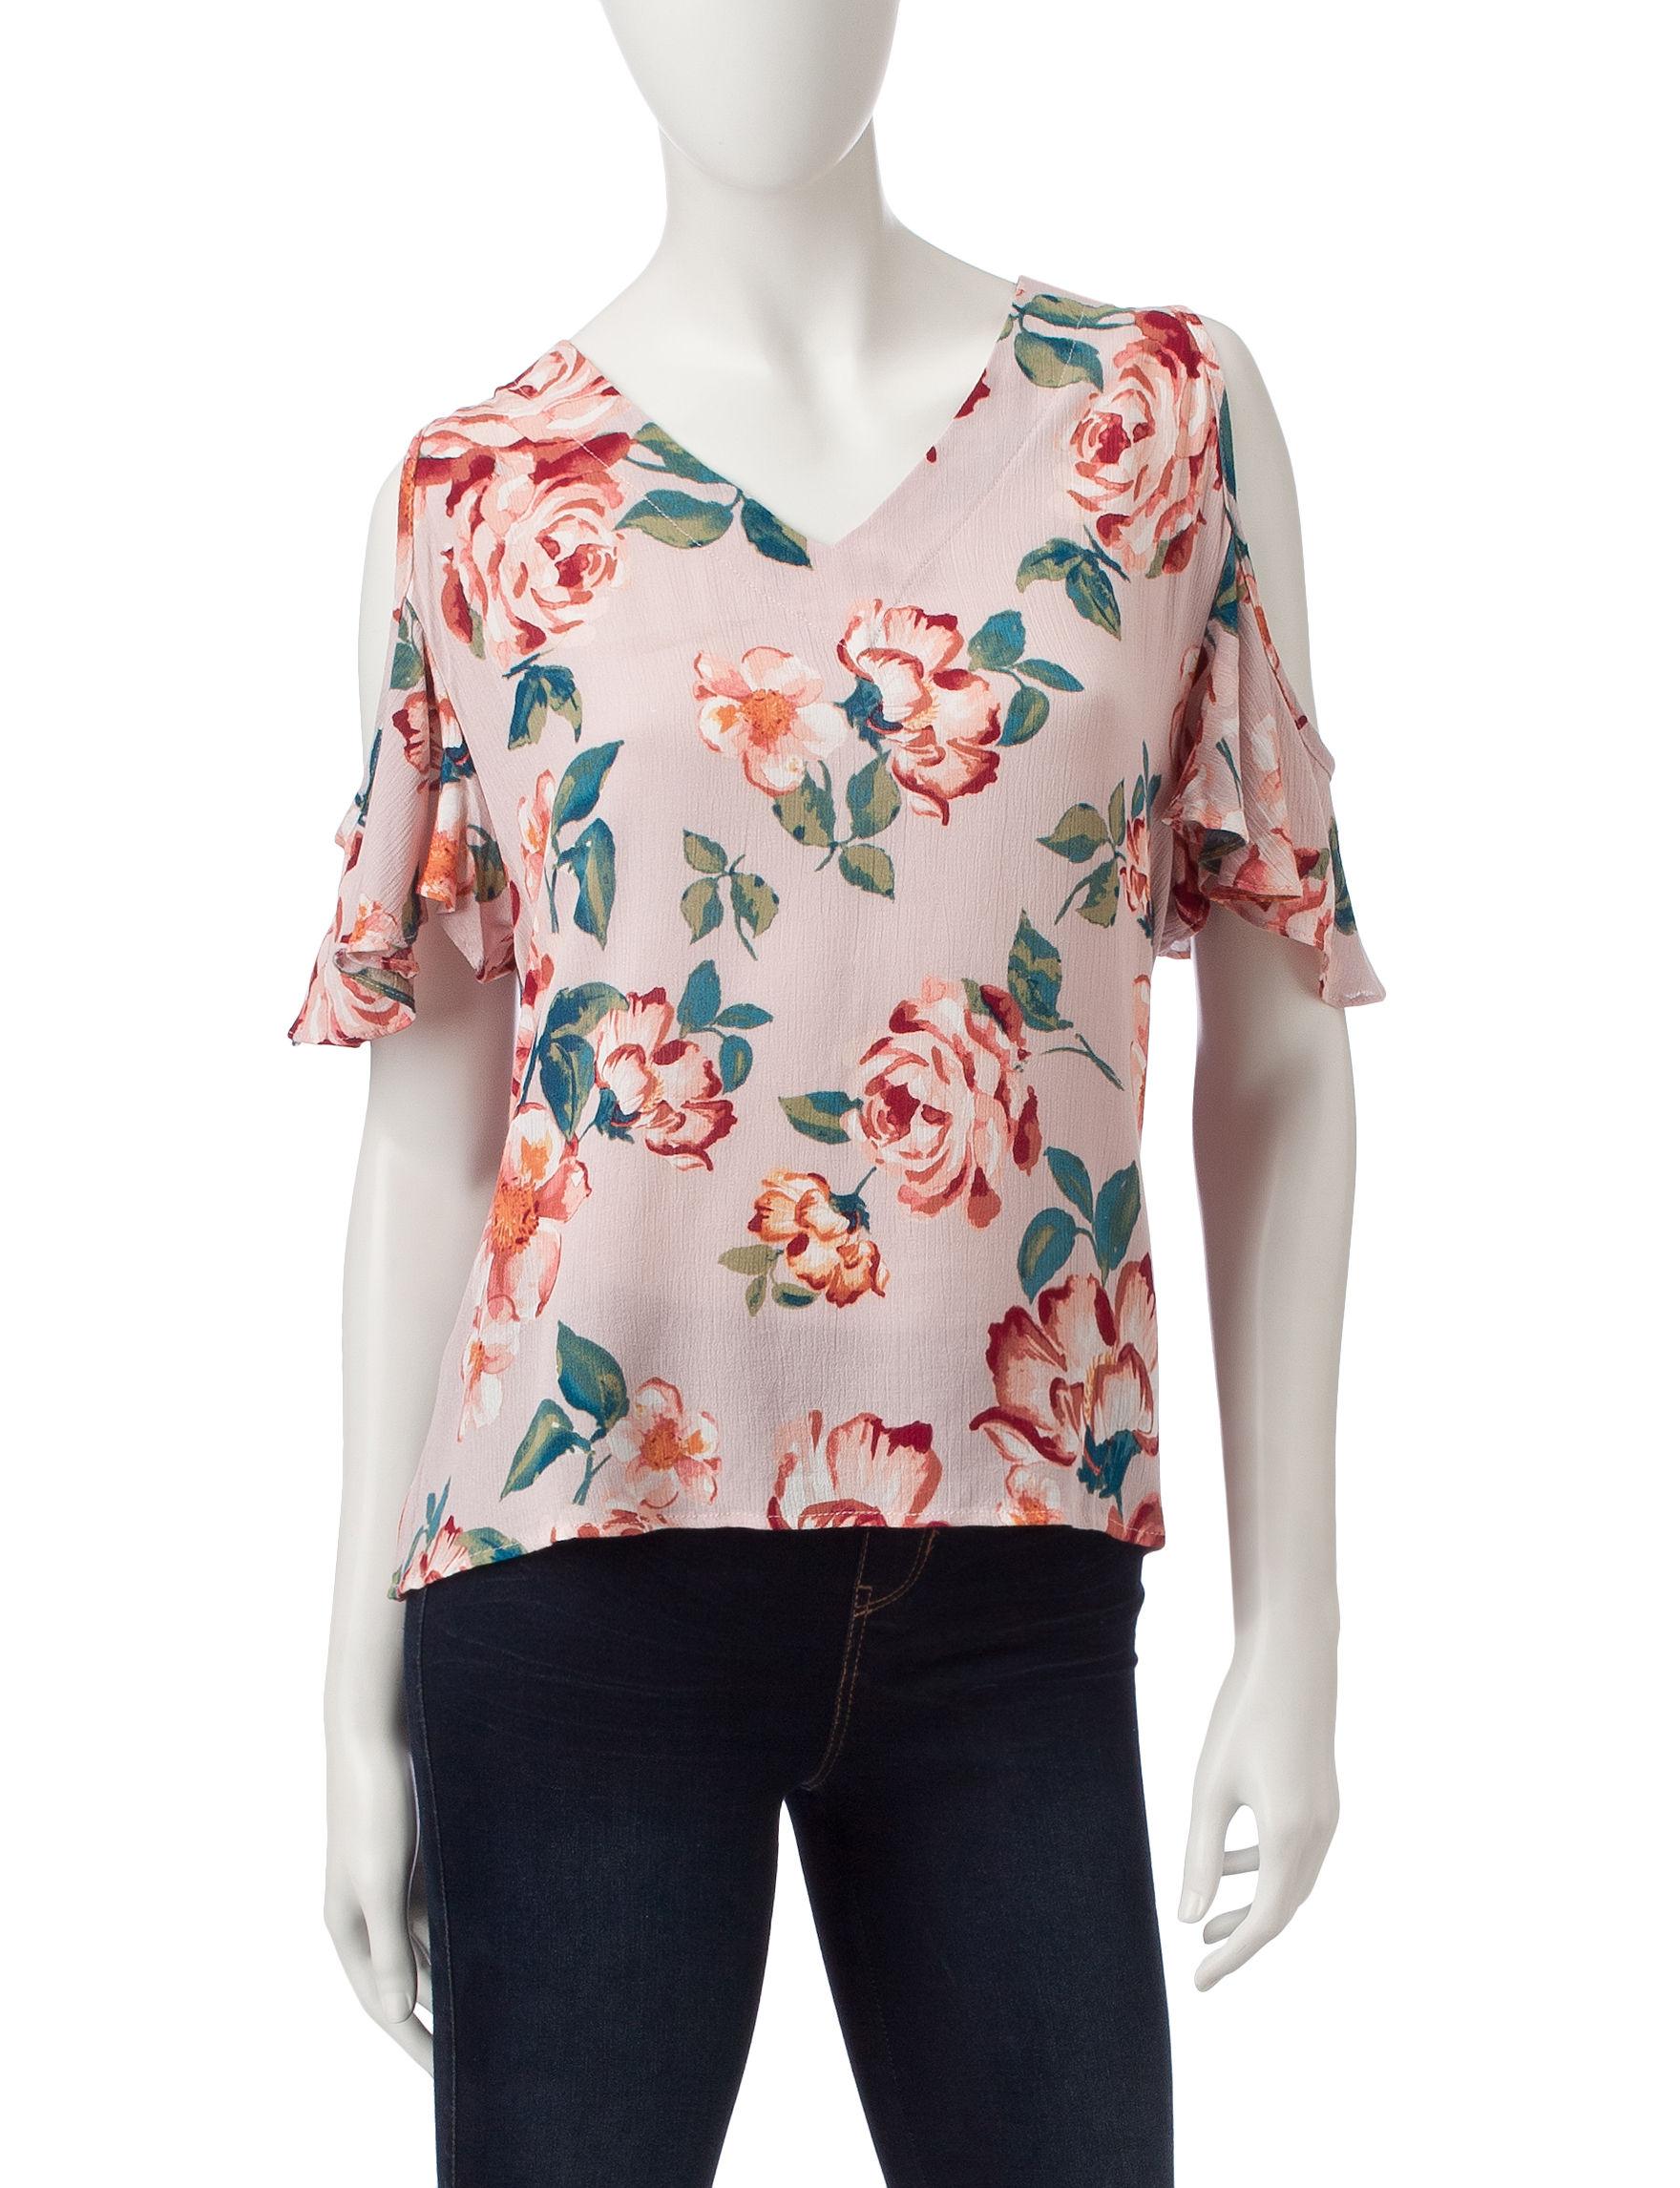 Wishful Park Pink Floral Shirts & Blouses